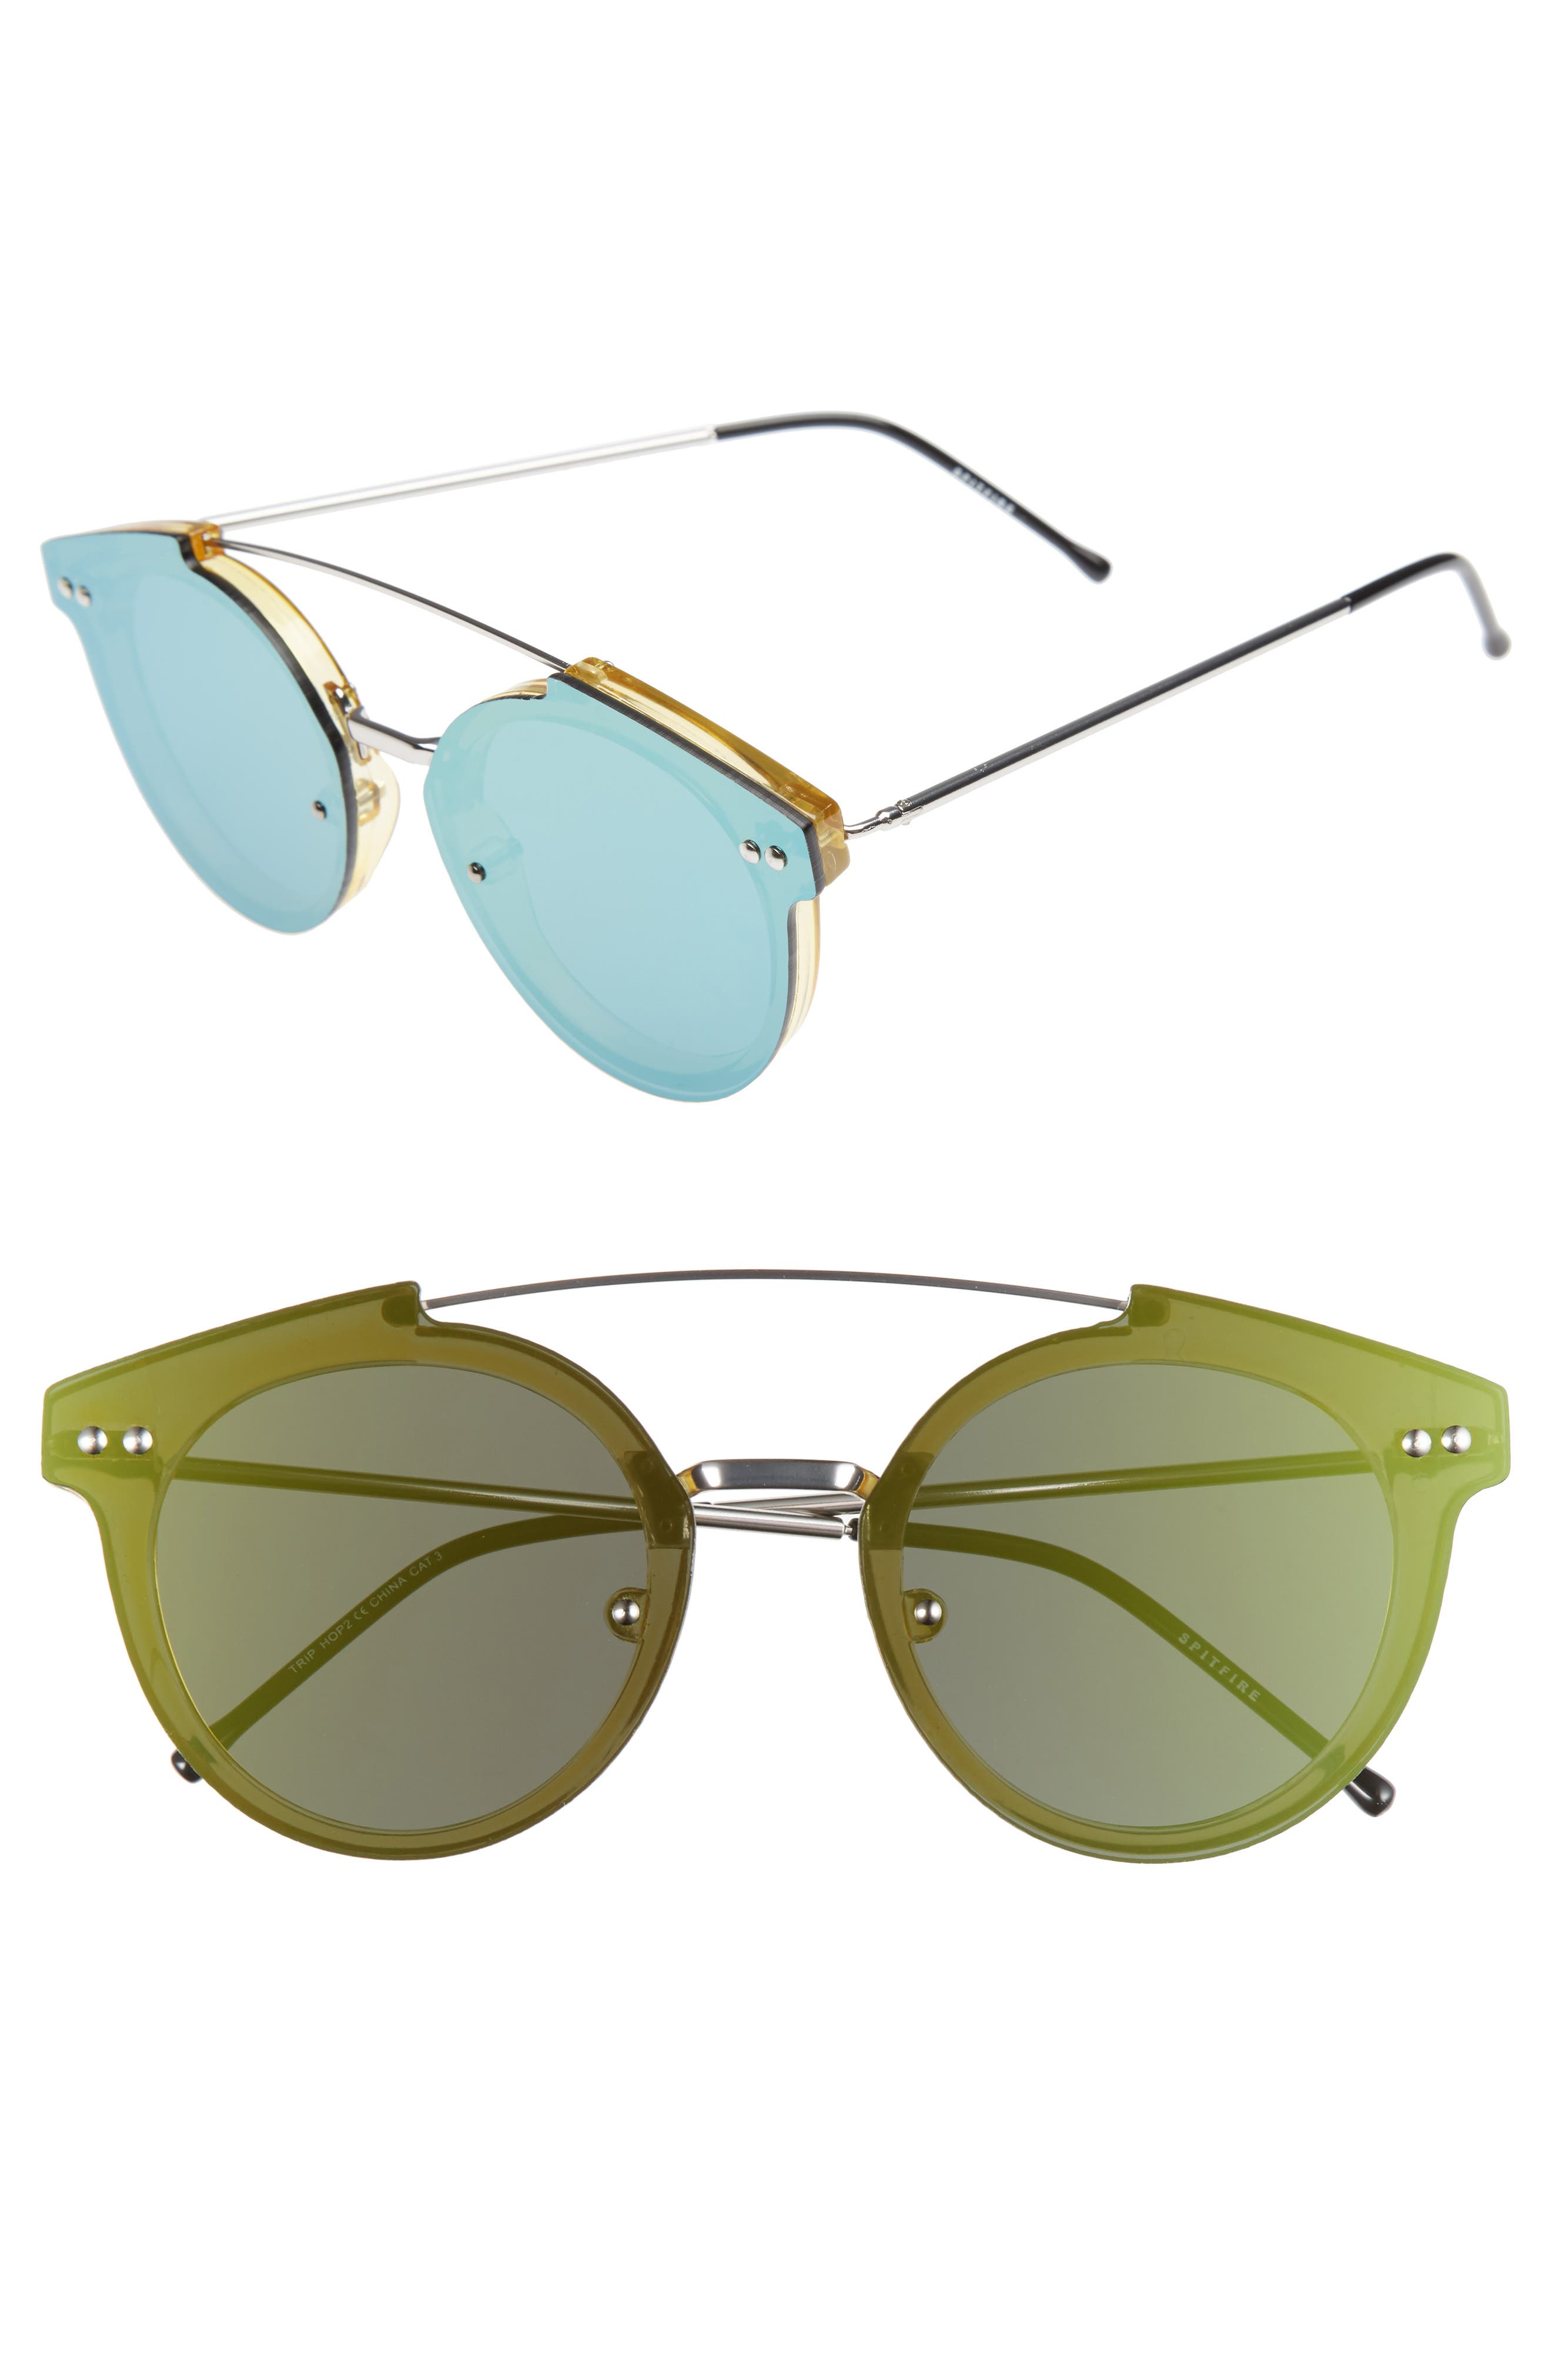 Spitfire Trip Hop 2 55mm Sunglasses